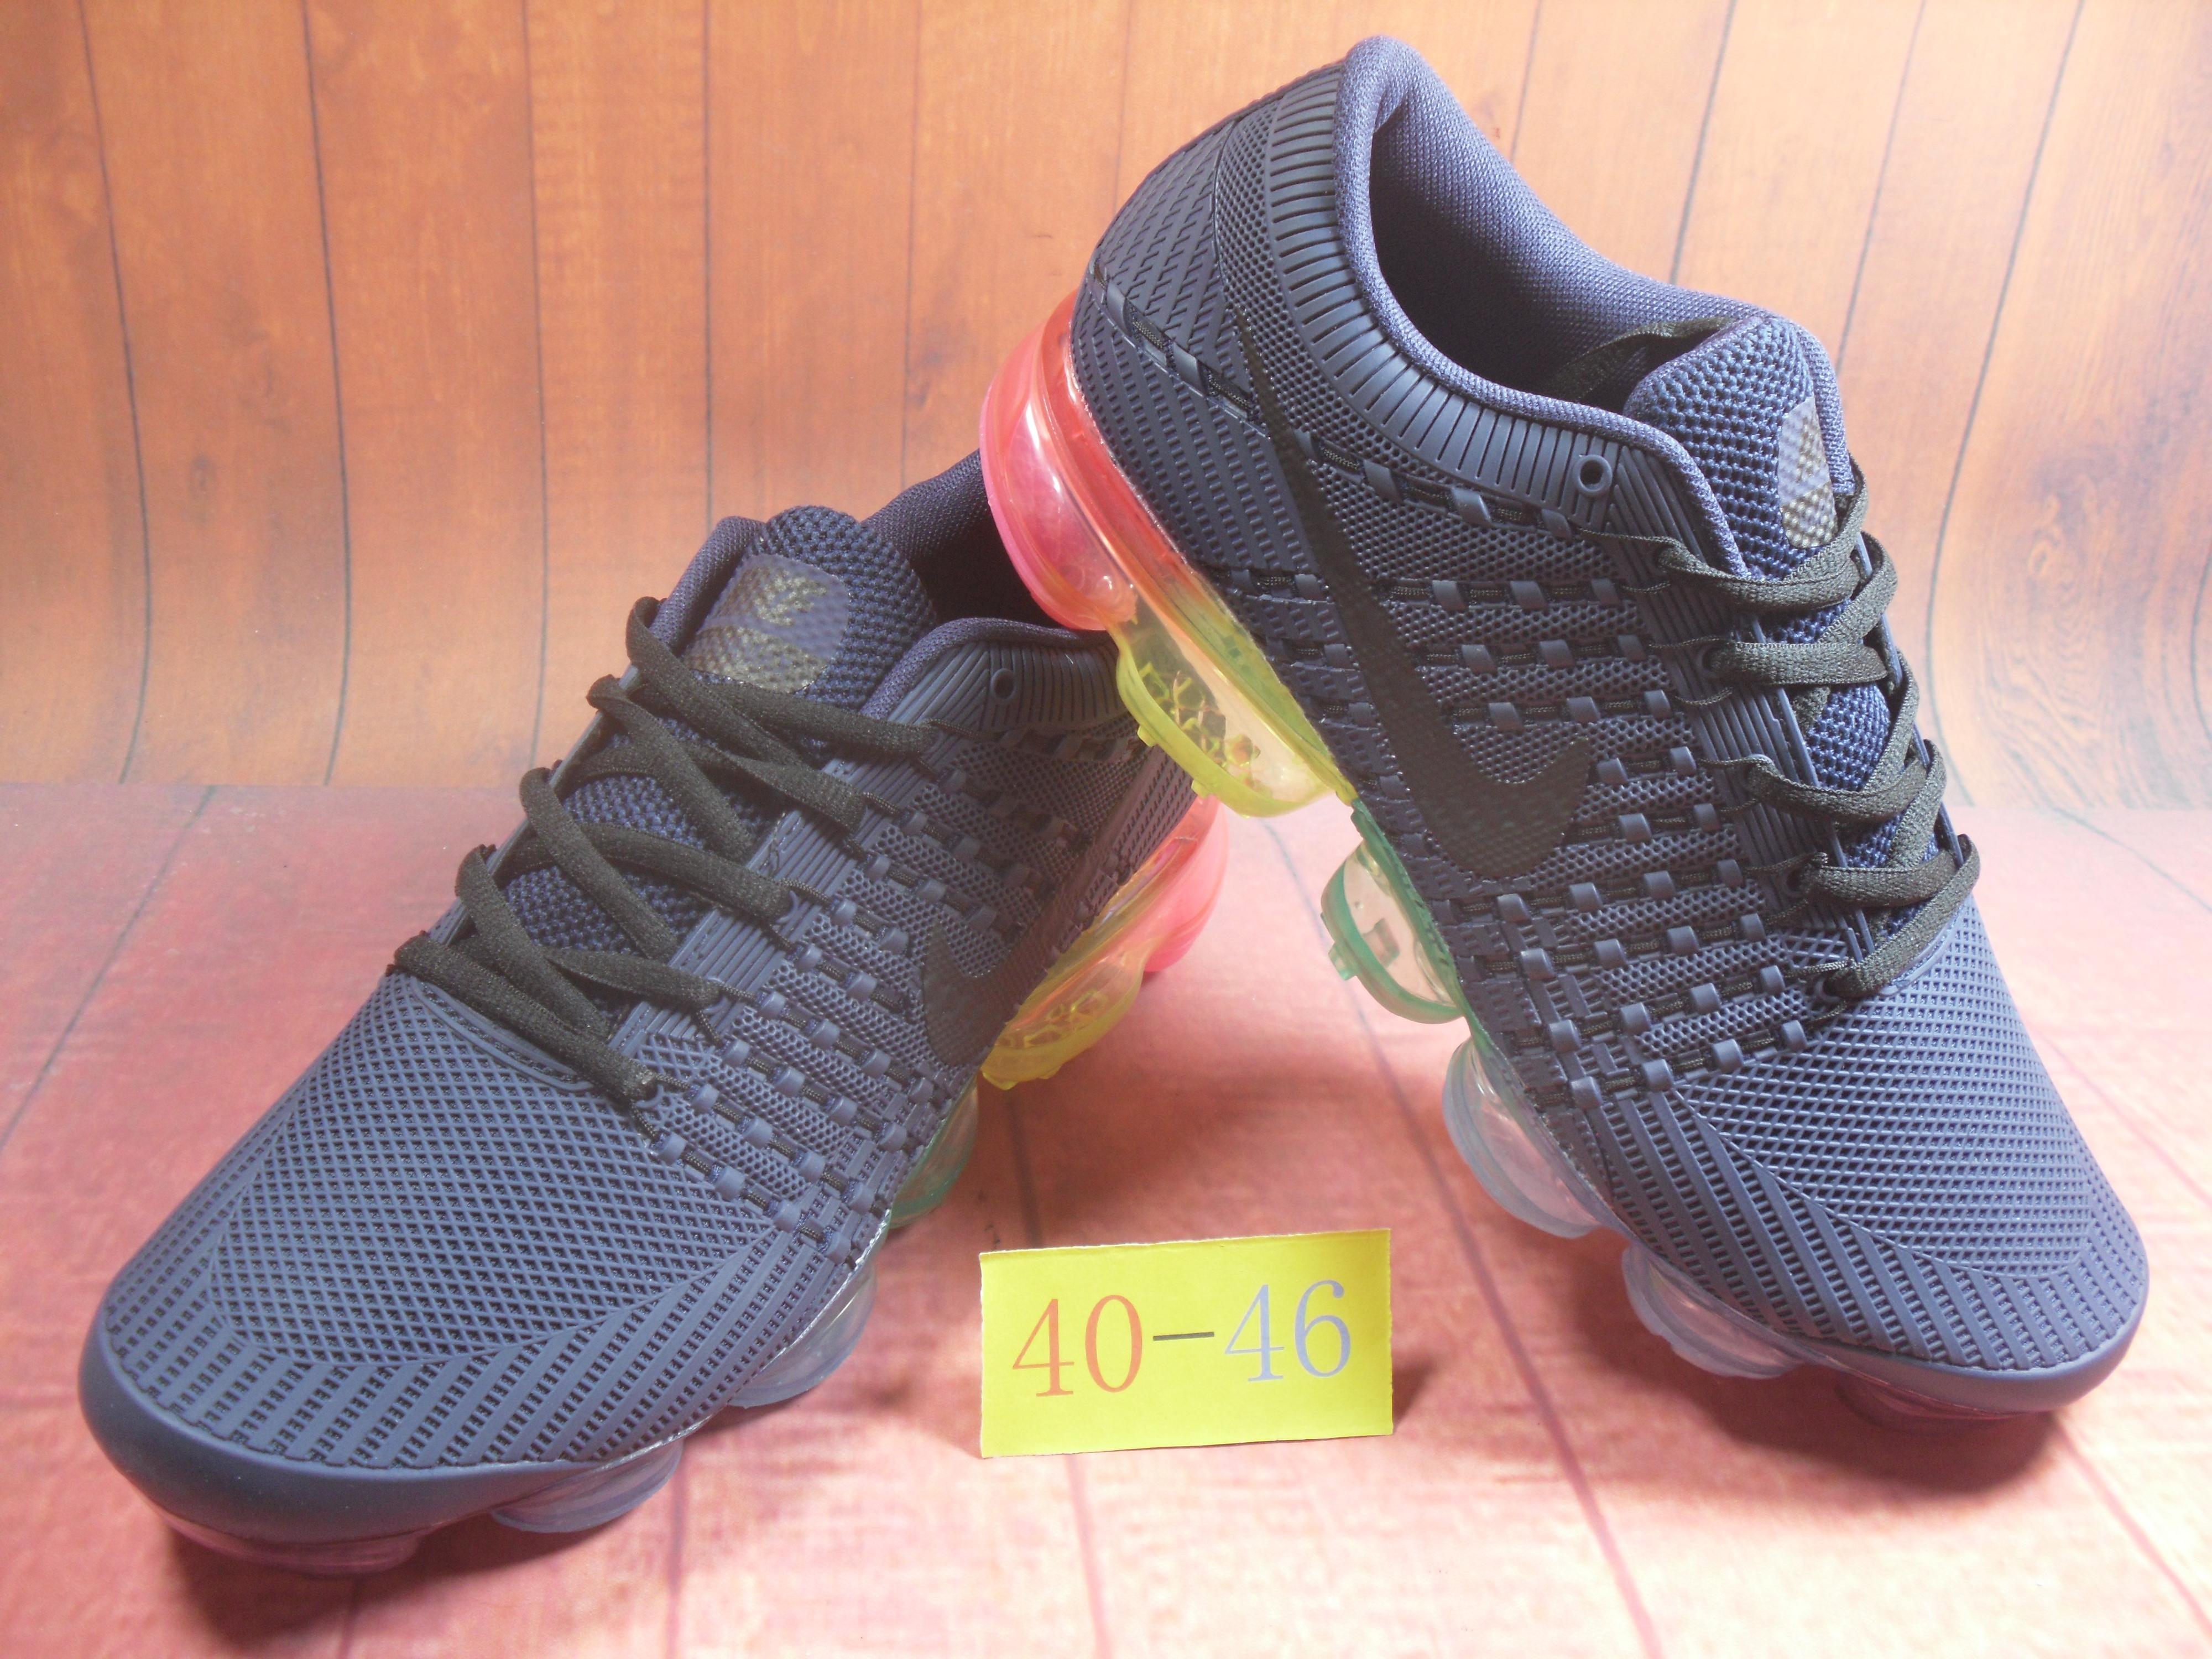 100% authentic 724a6 7601d Nike Air Vapormax Zapatillas Nike en Bs.As. G.B.A. Oeste en